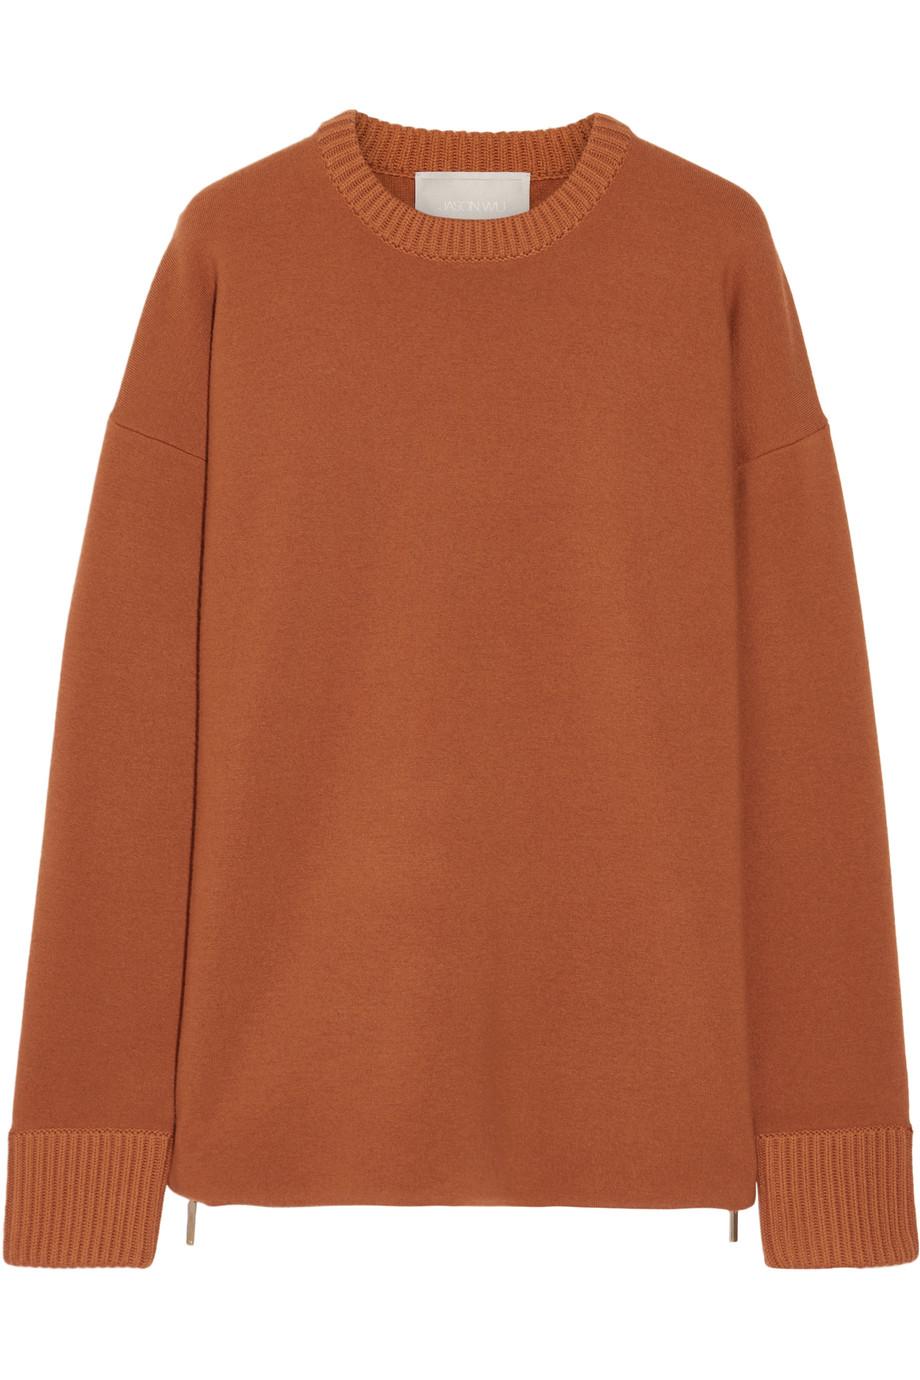 Jason Wu Oversized Zip-Detailed Stretch-Knit Sweater, Orange, Women's, Size: L